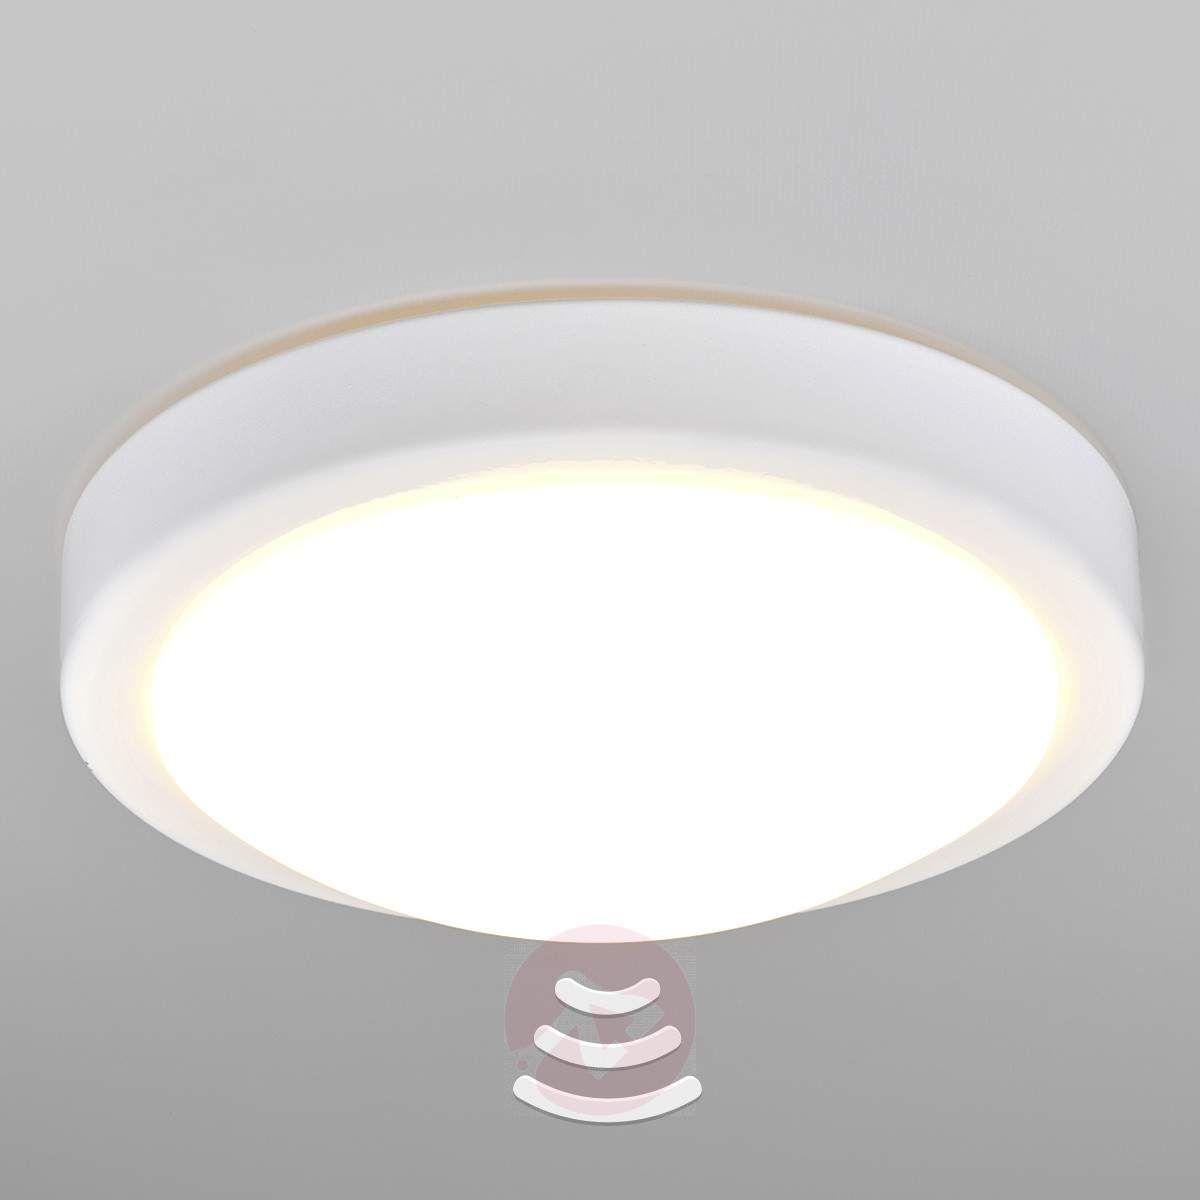 Badezimmer-LED-Deckenlampe Aras mit Sensor, weiß-Sensor ...